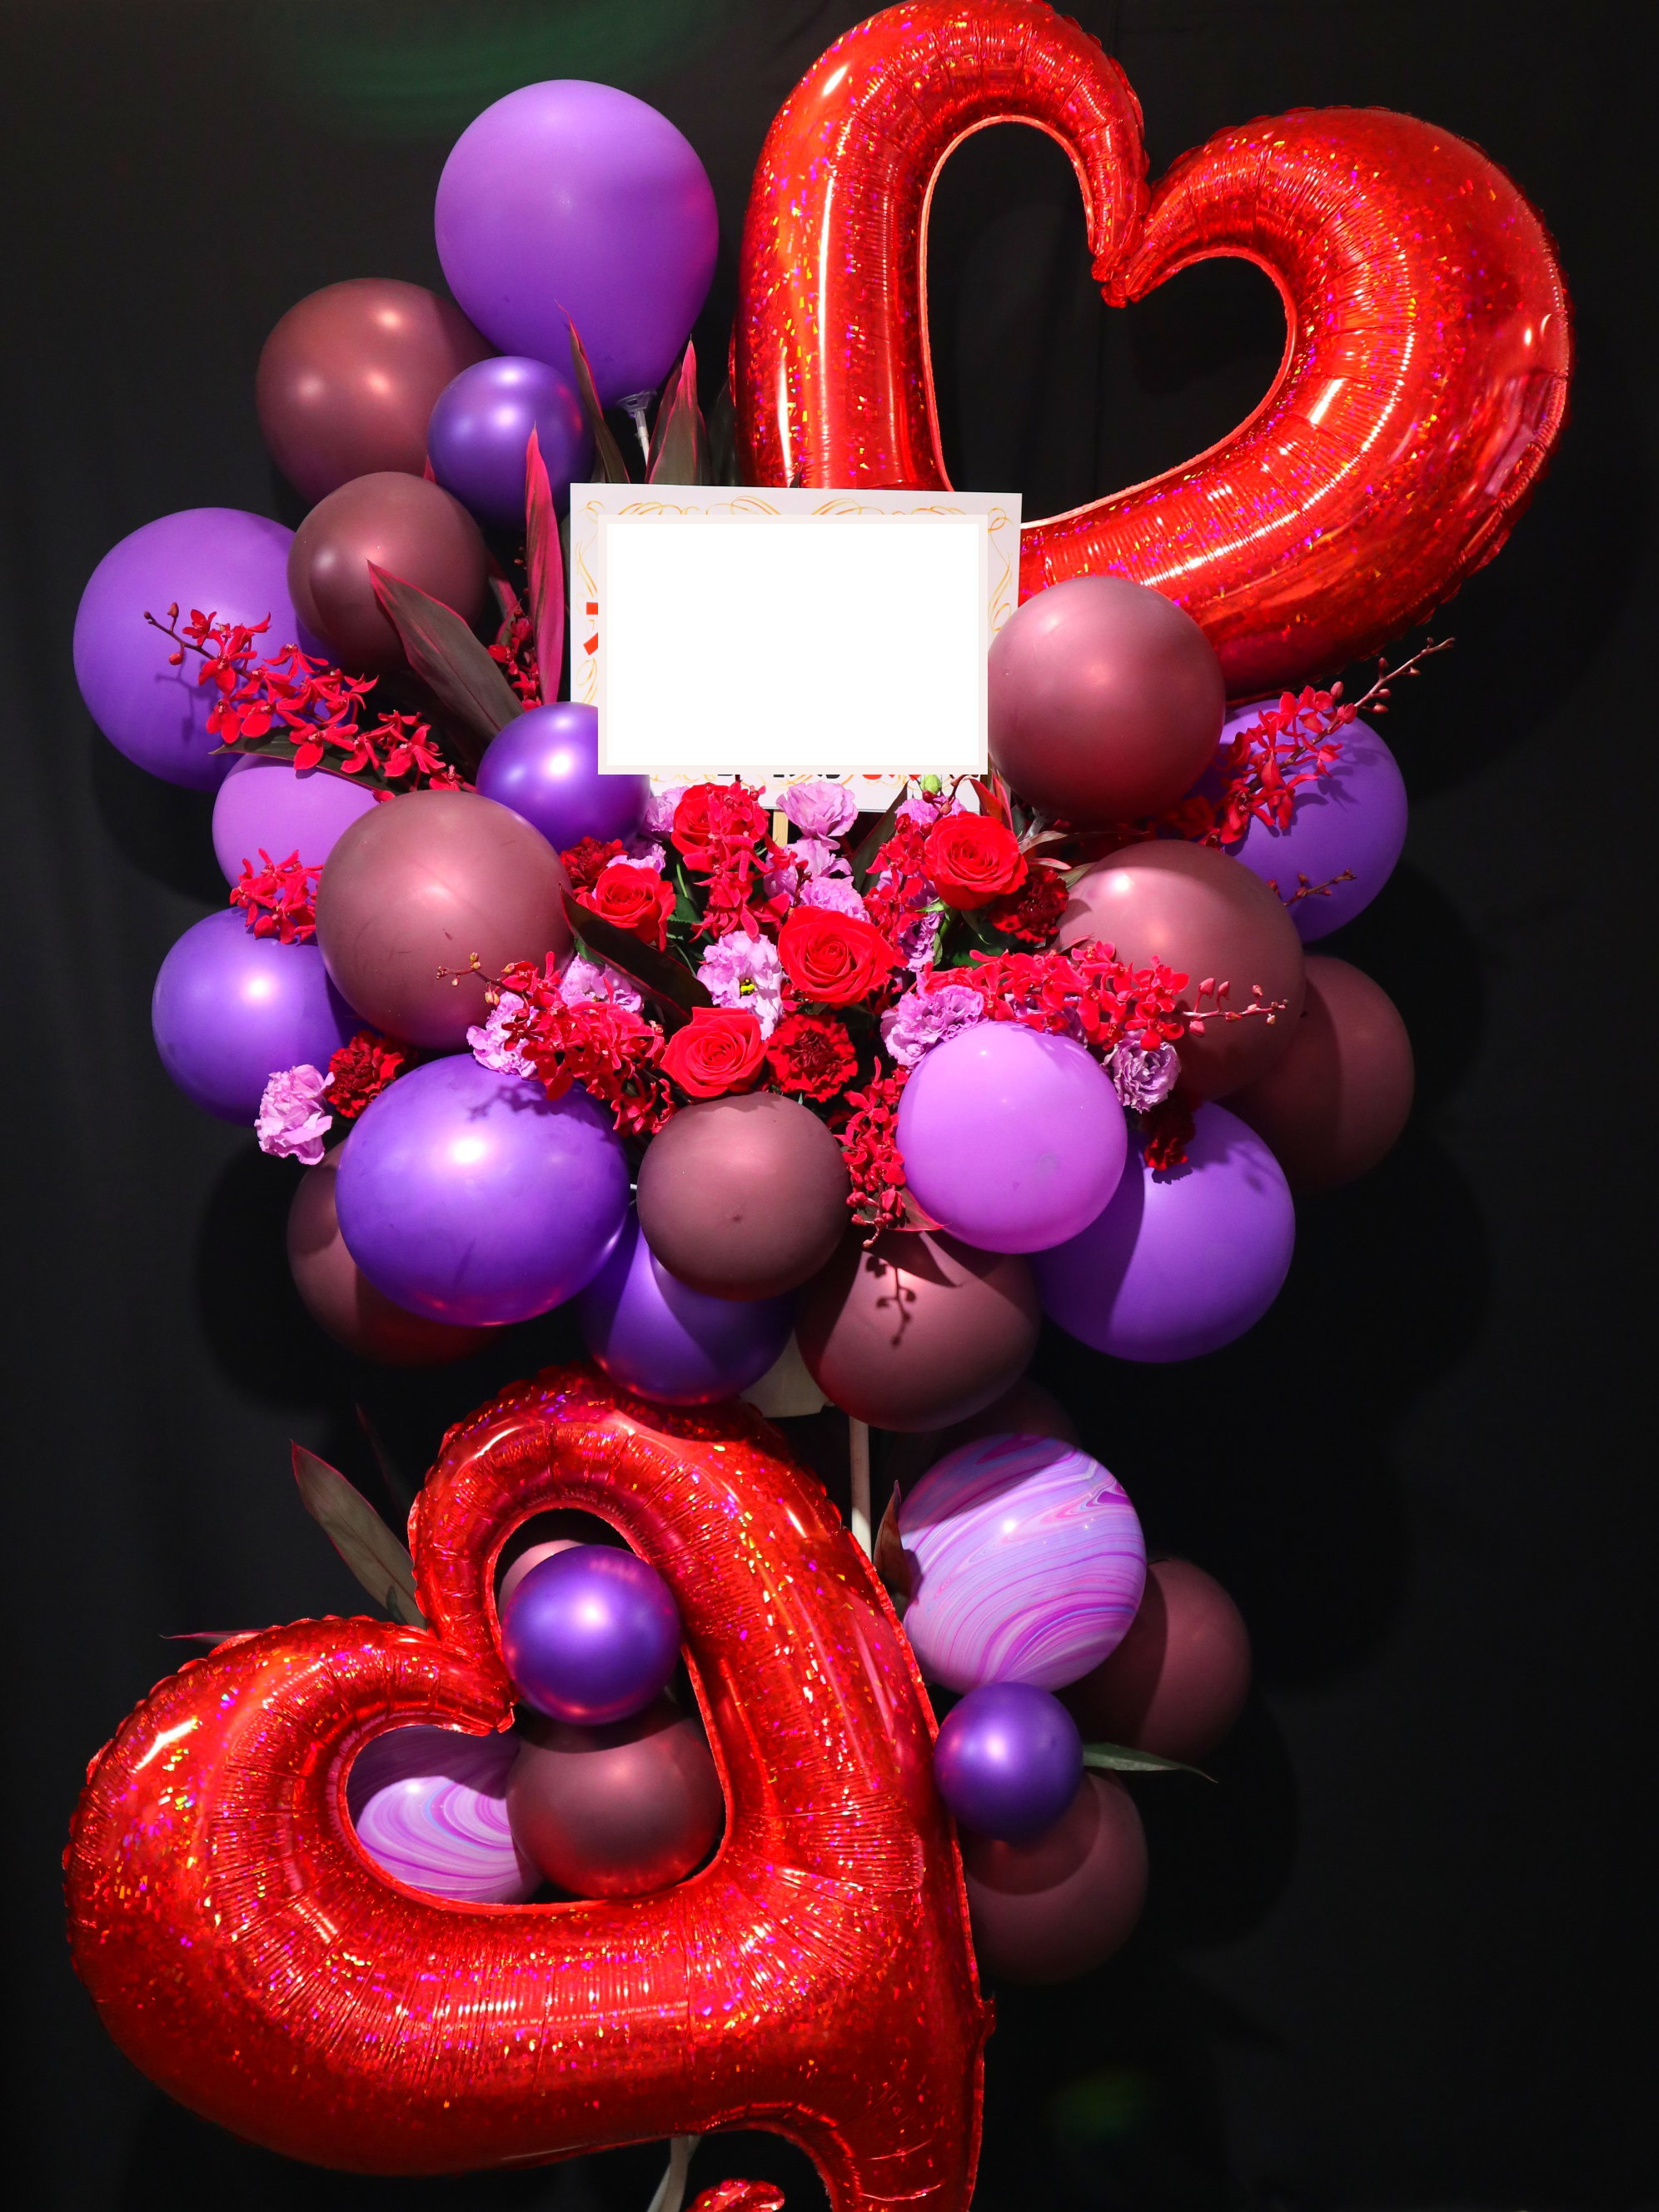 bst087 バルーンスタンド 赤・紫系2段